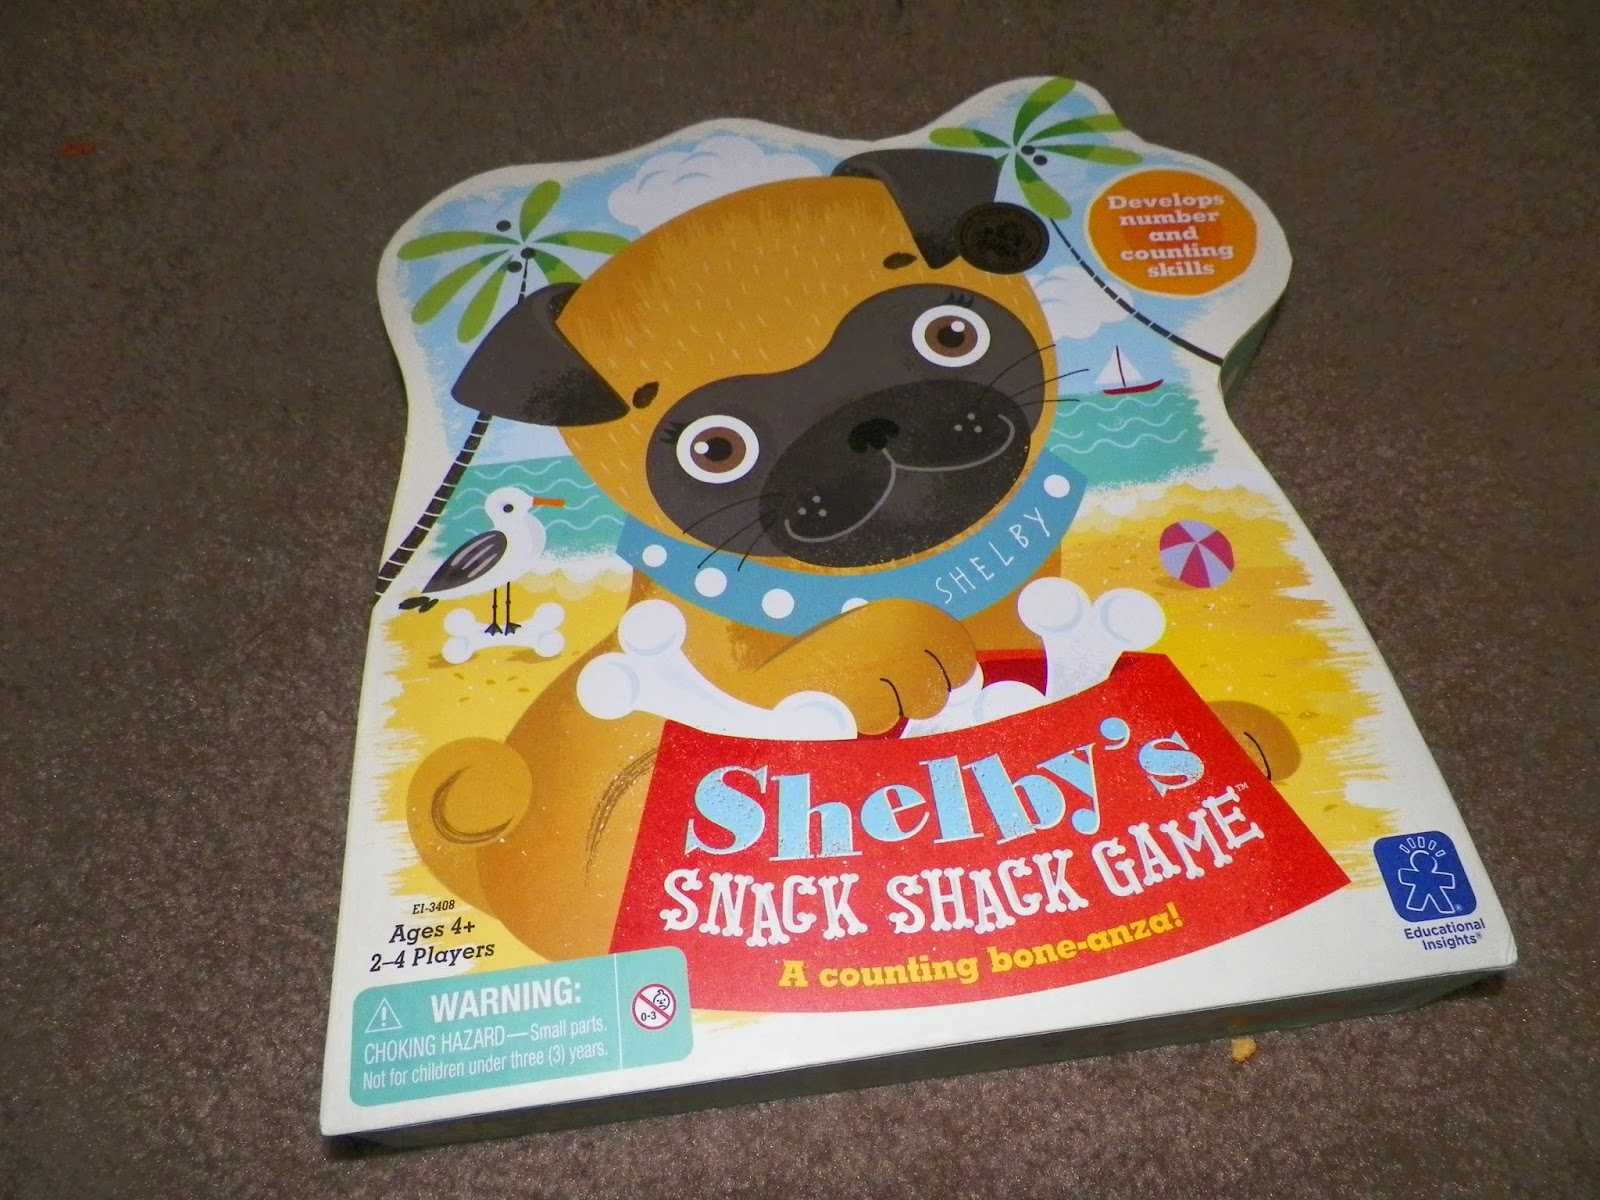 ShelbysSnackShackGame.jpg